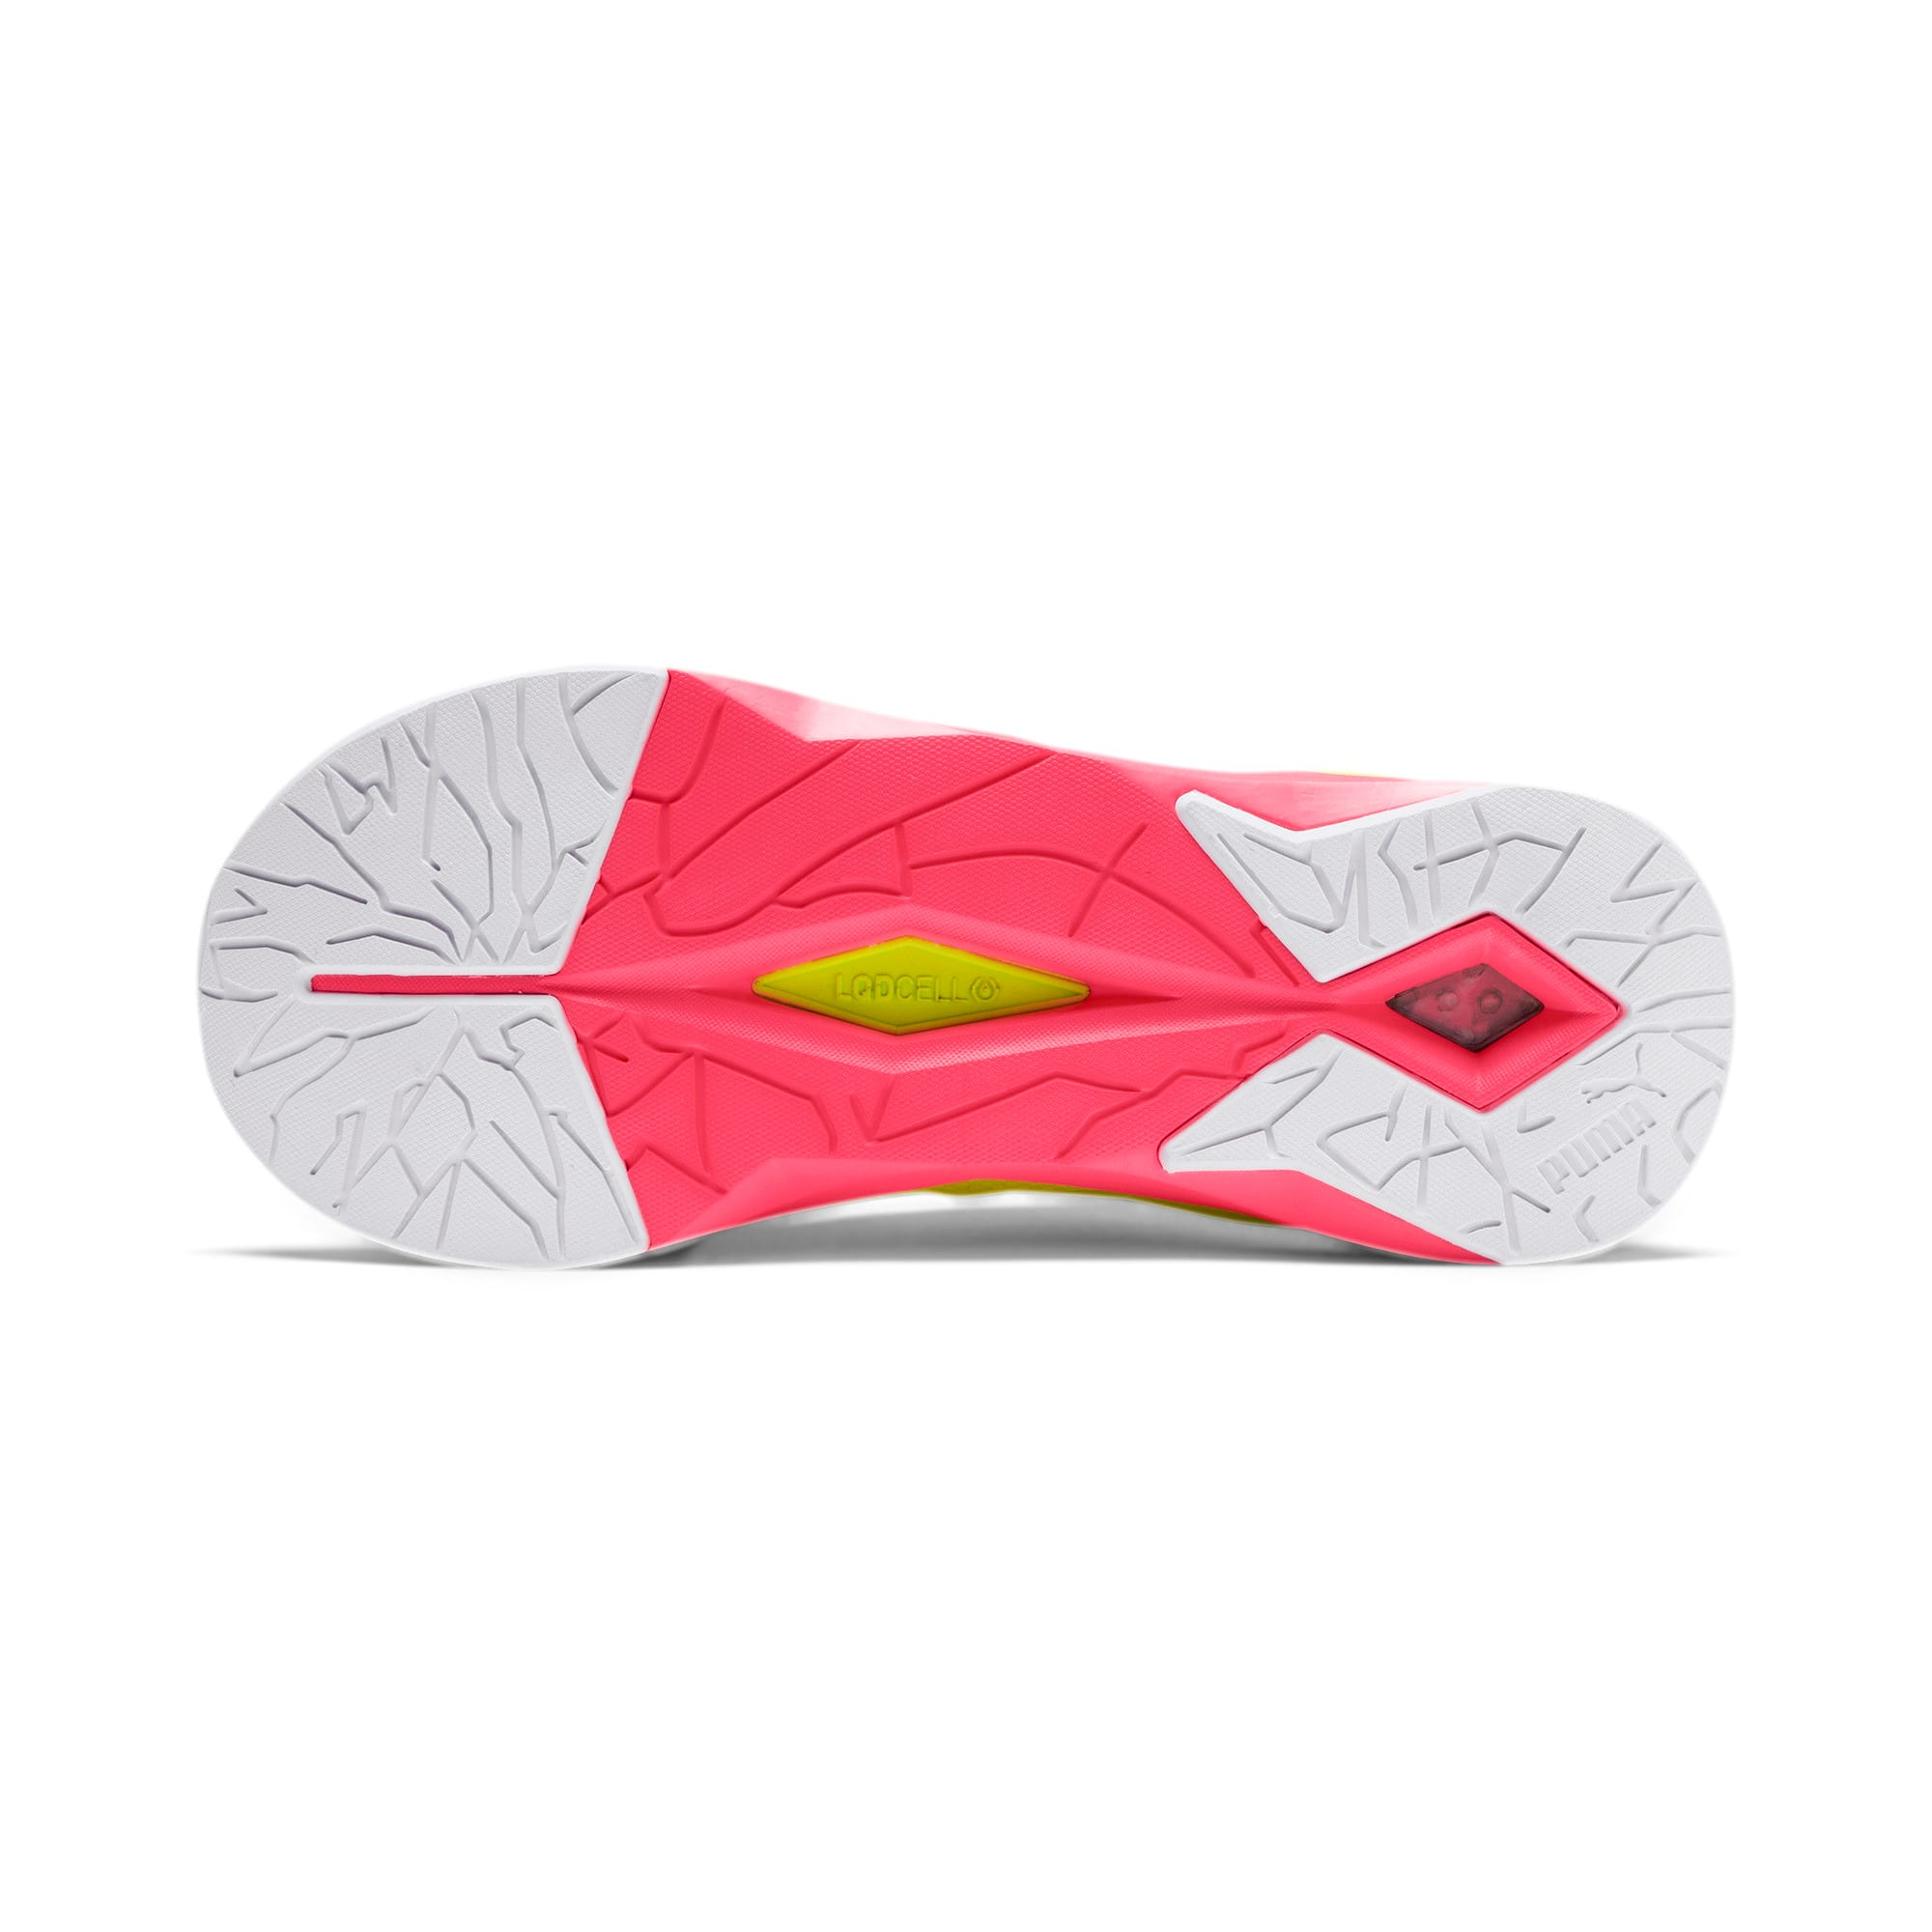 Thumbnail 5 of LQDCELL Shatter XT Women's Training Shoes, Puma White-Pink Alert, medium